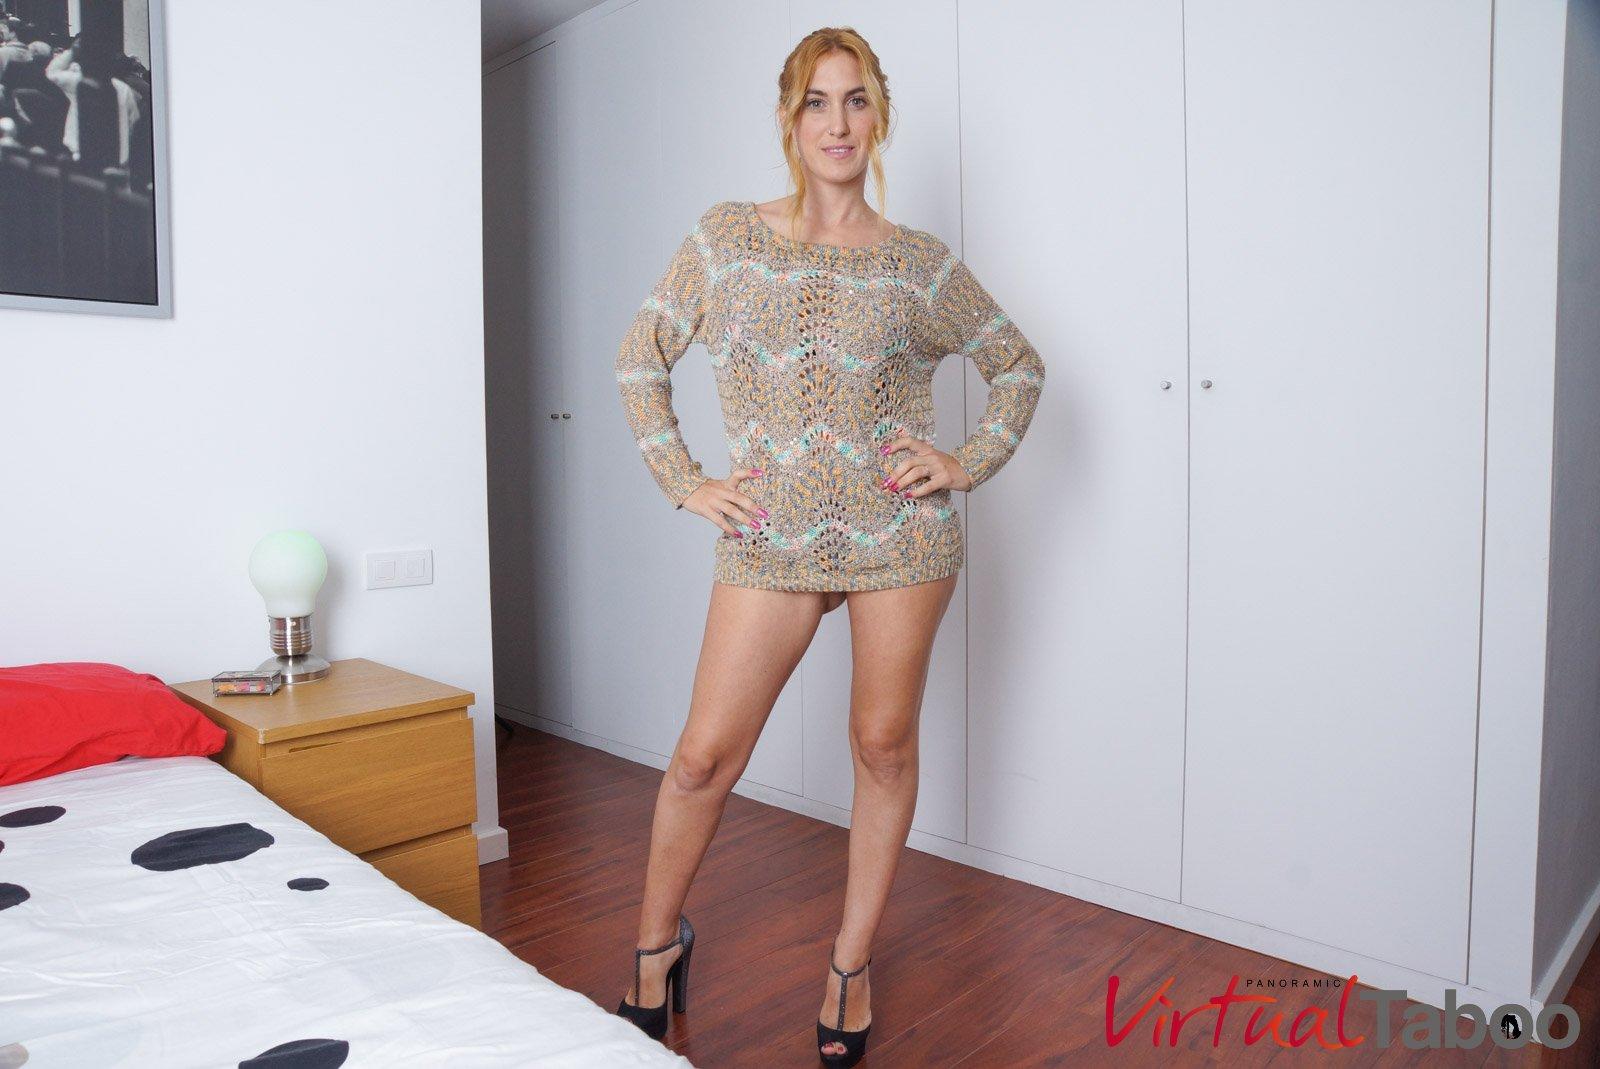 ducha de Valeria Sexo Virtual